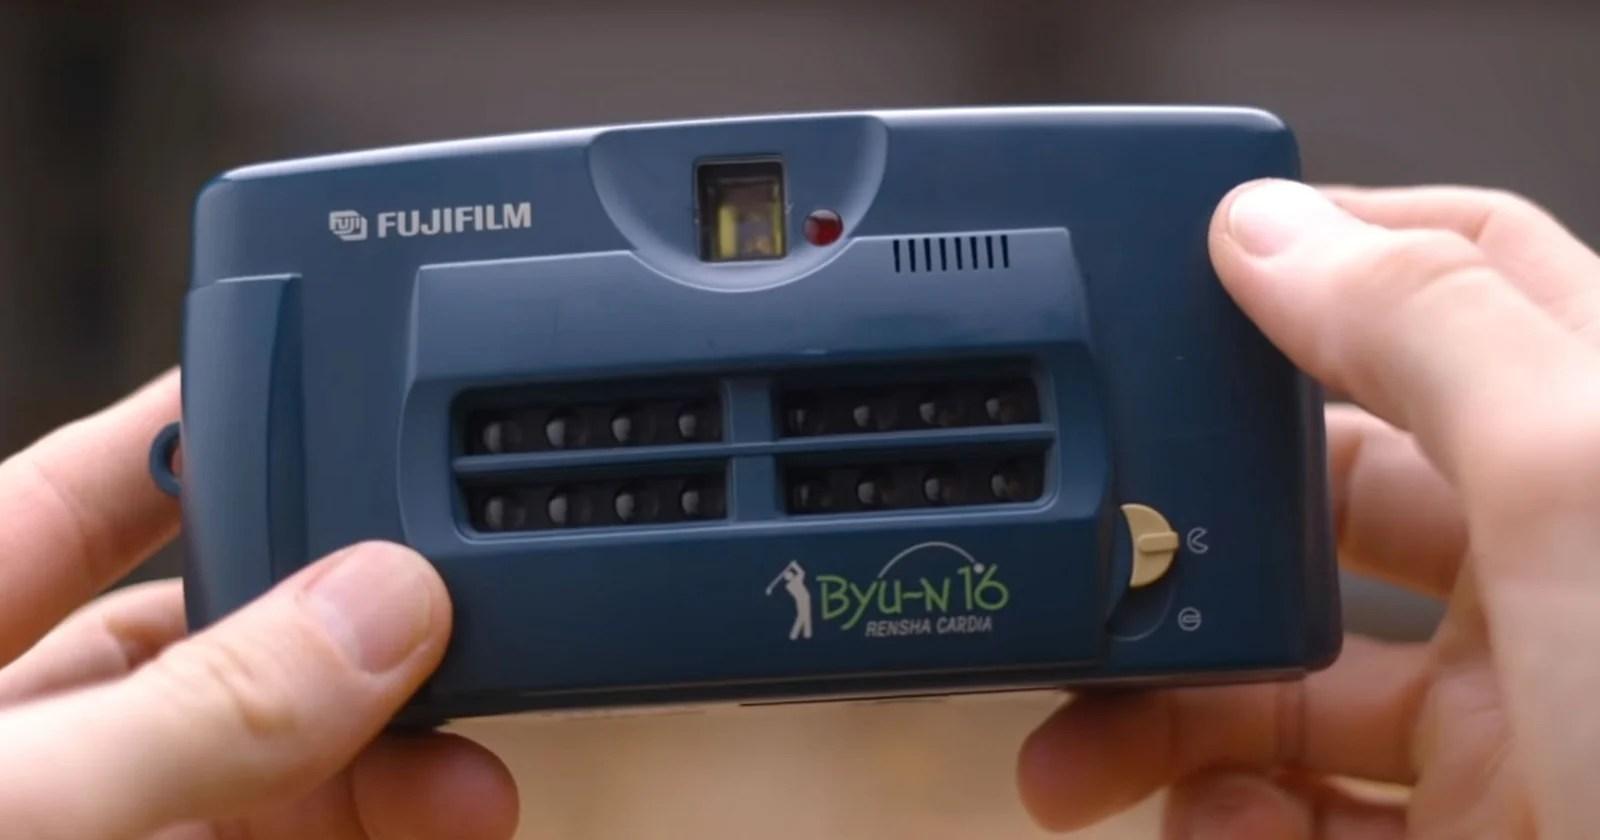 La fotocamera Fujifilm Rensha Cardia Byu-N 16 è una macchina Gif con pellicola da 35 mm